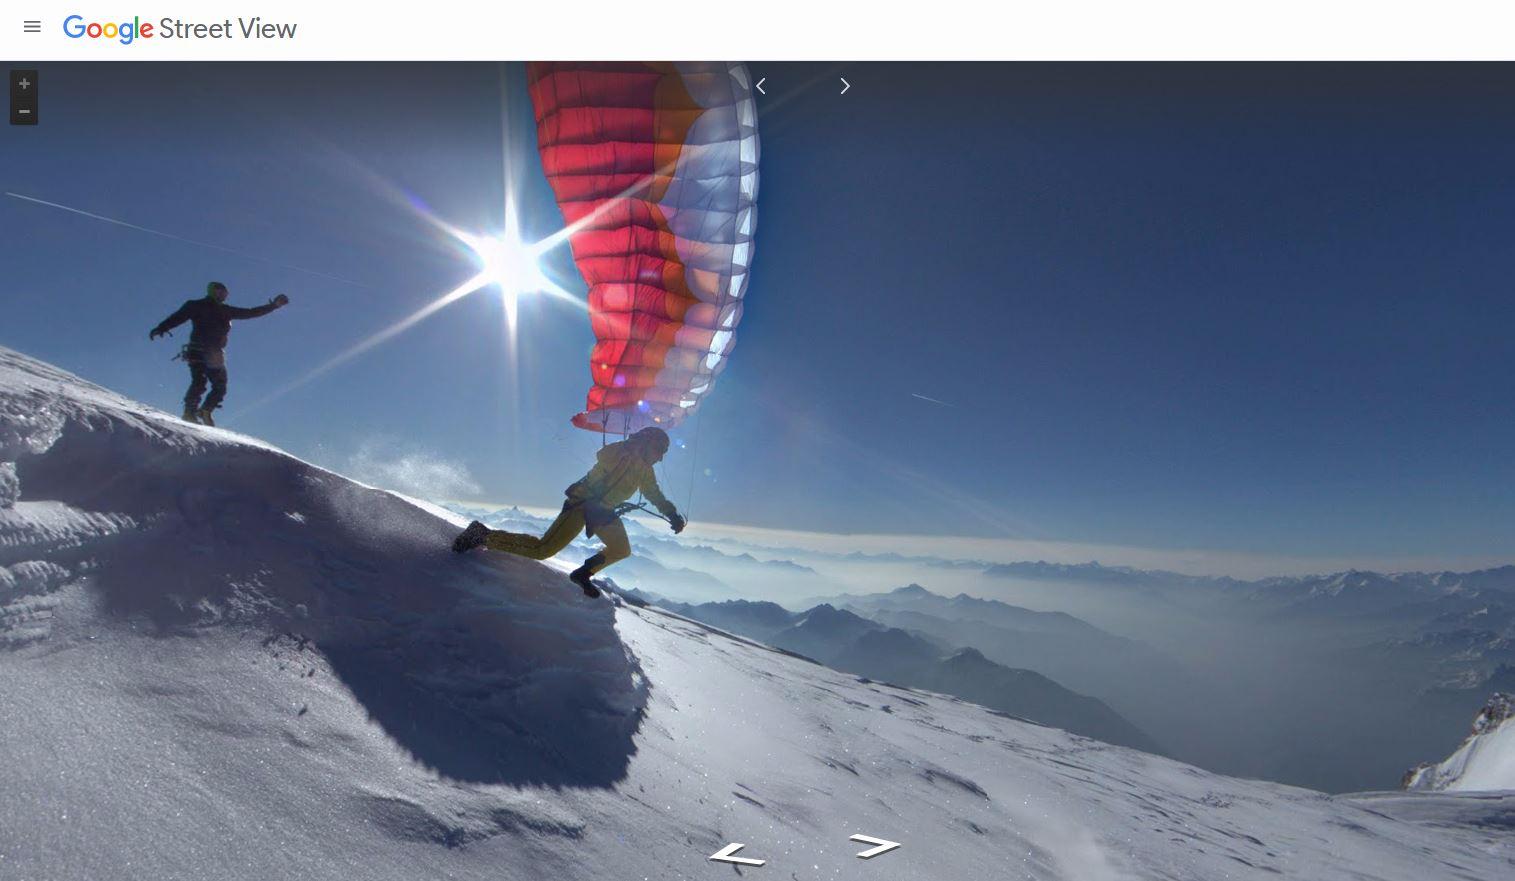 Google Street View Mont Blanc